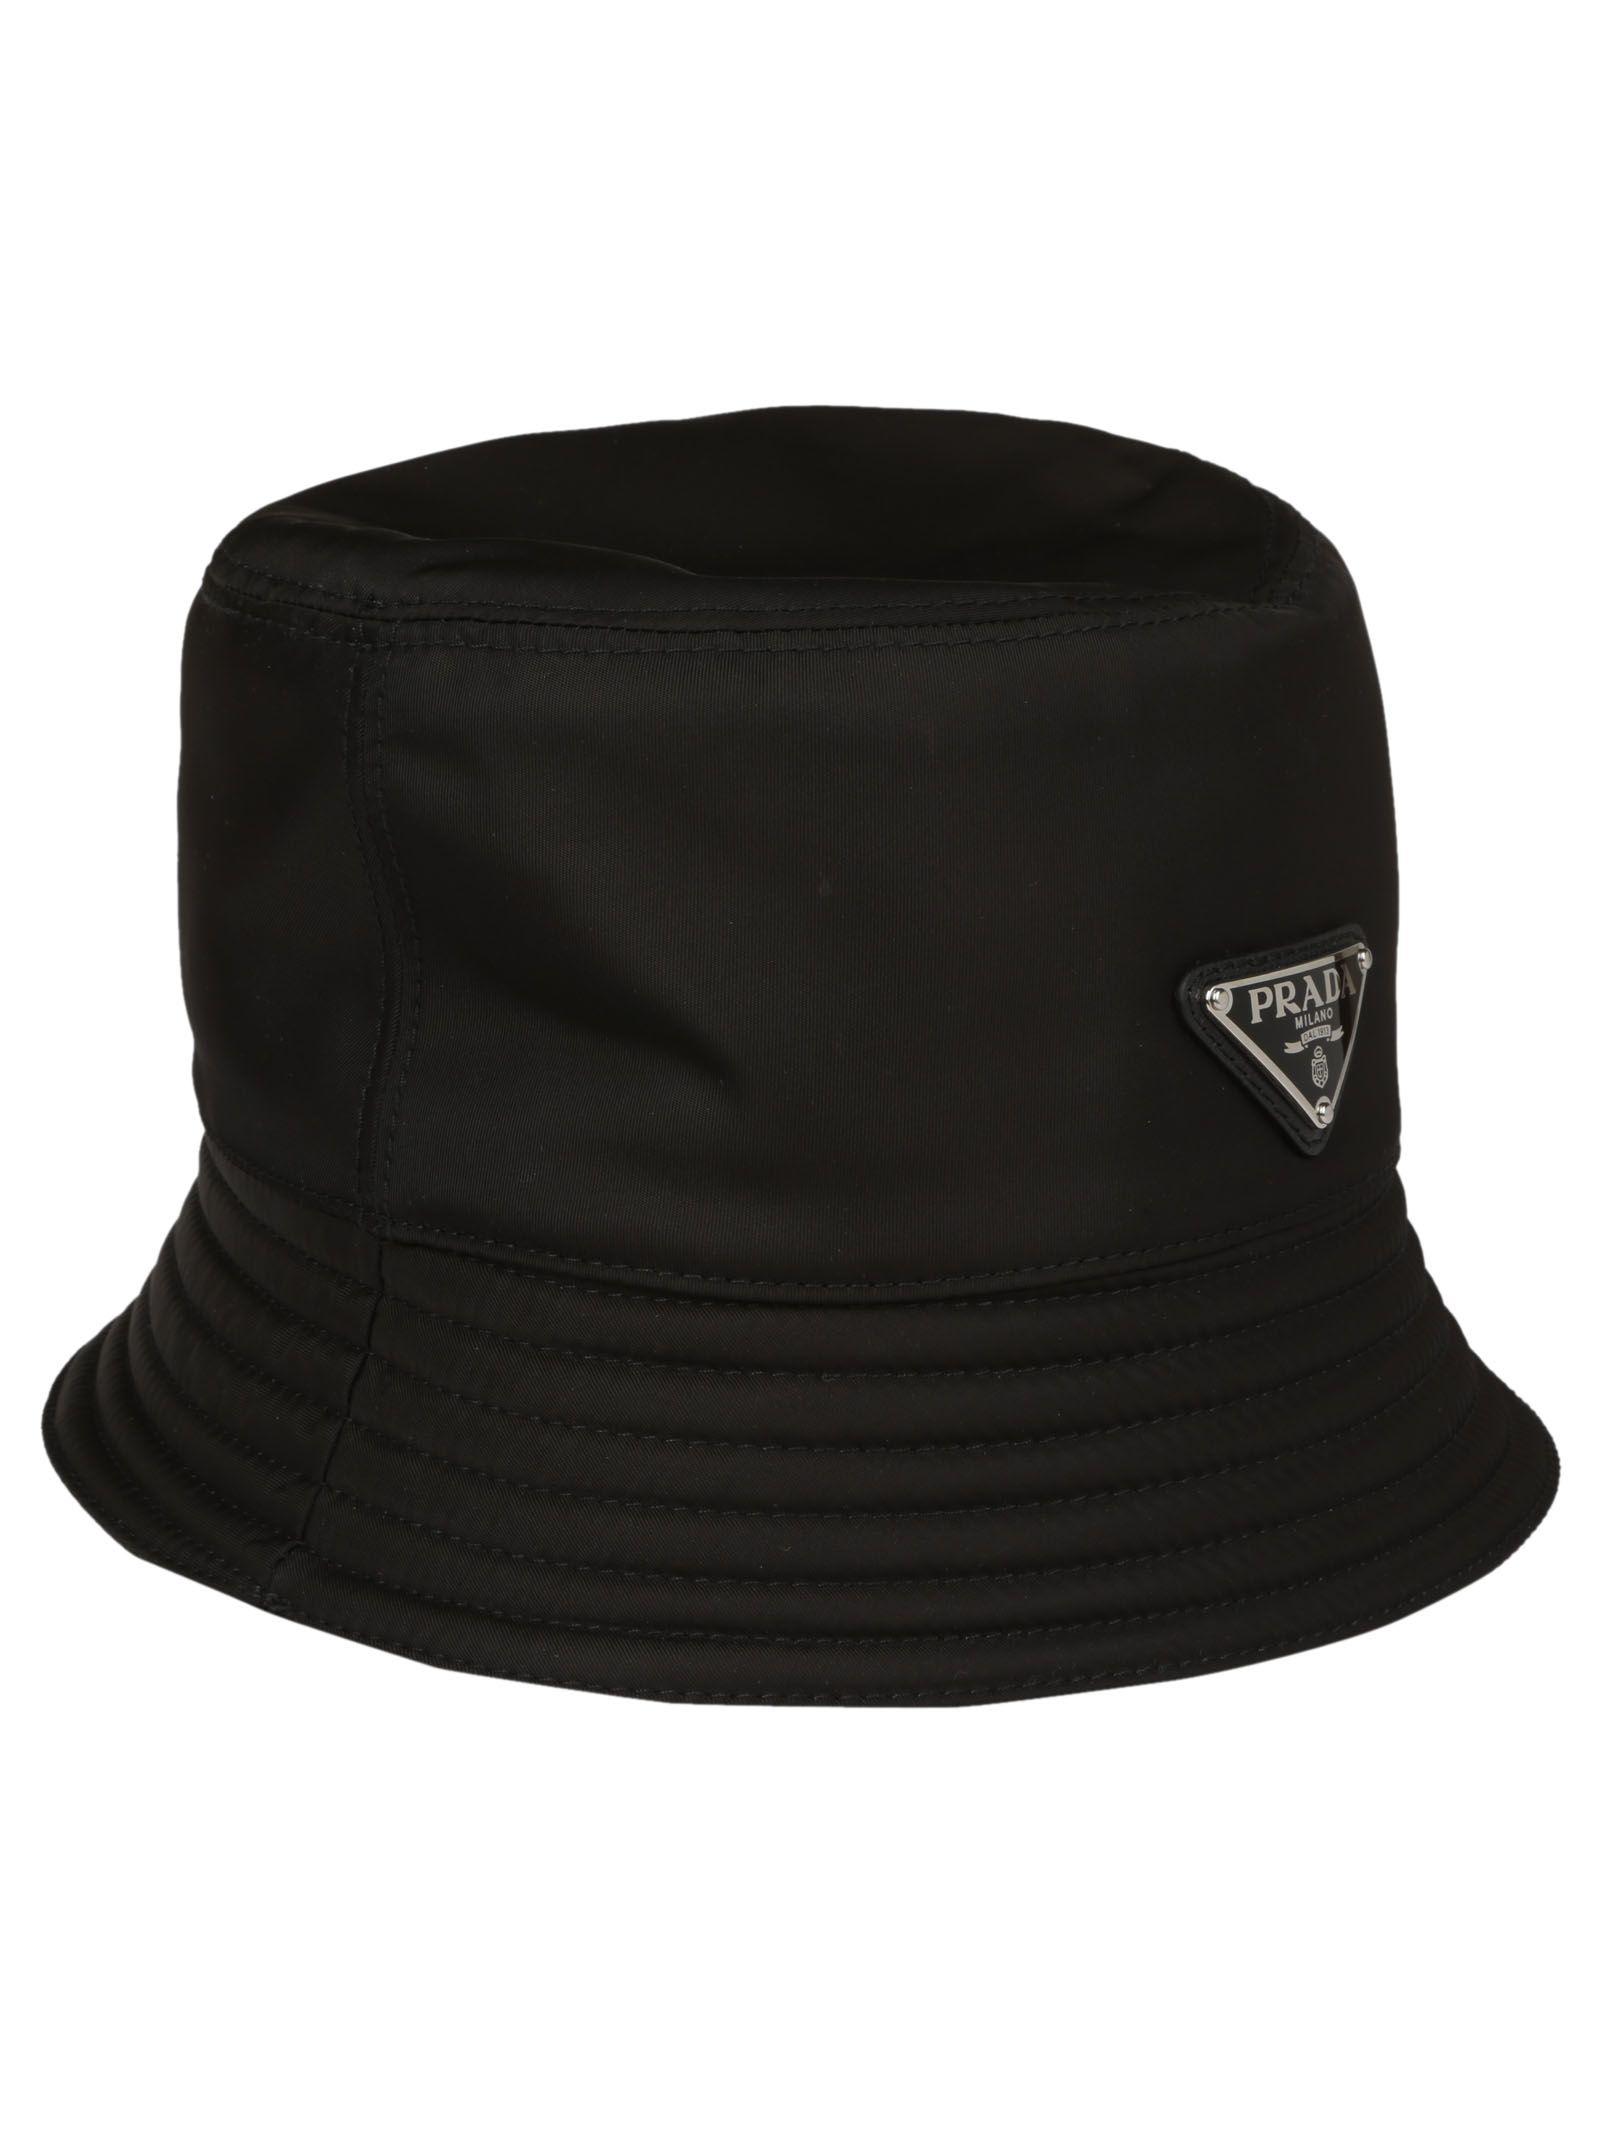 c87c6f22 Prada Men's Nylon Bucket Hat With Logo In Black | ModeSens